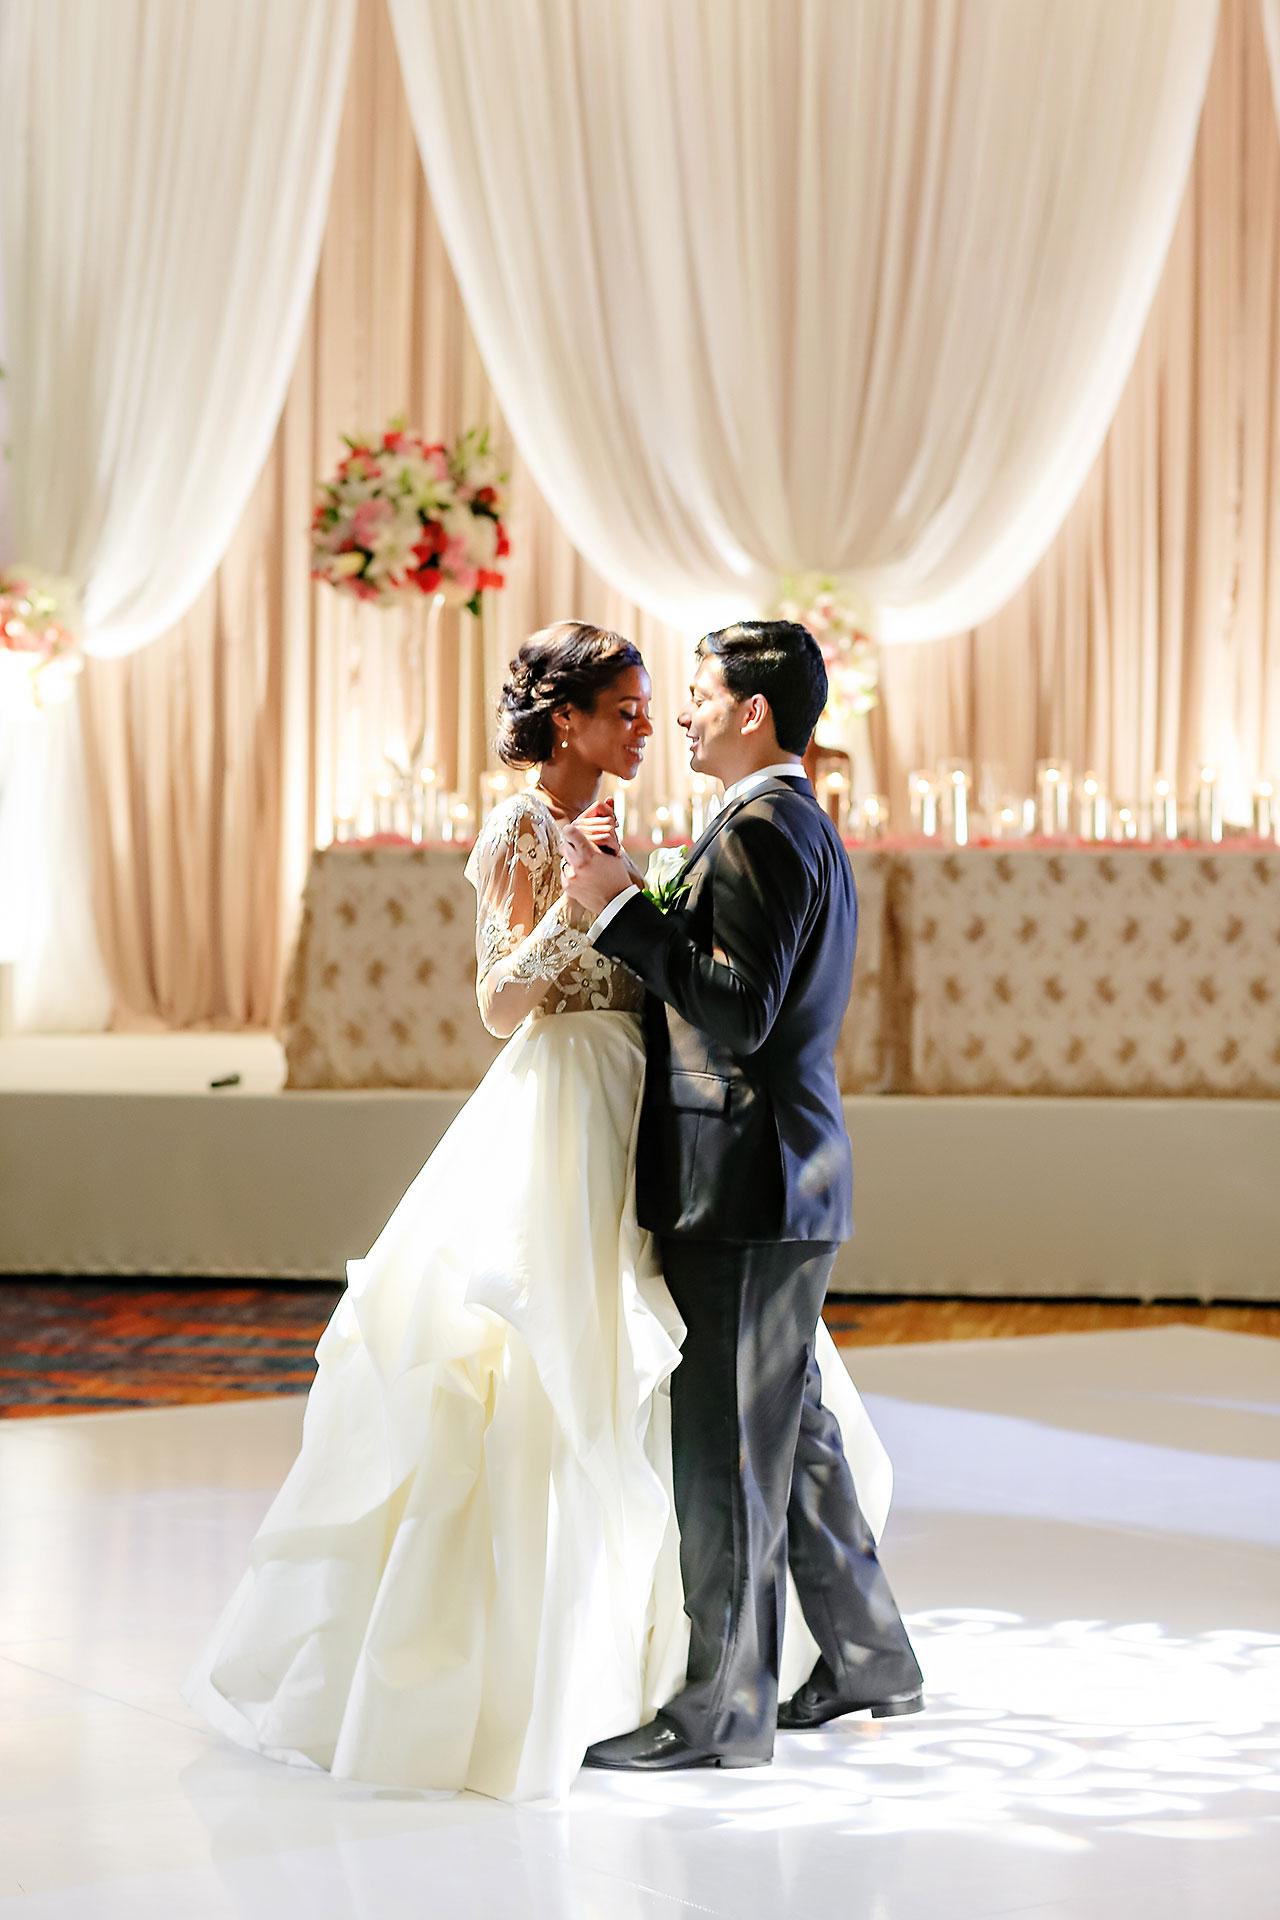 Joie Nikhil JW Marriott Indianapolis Wedding 115